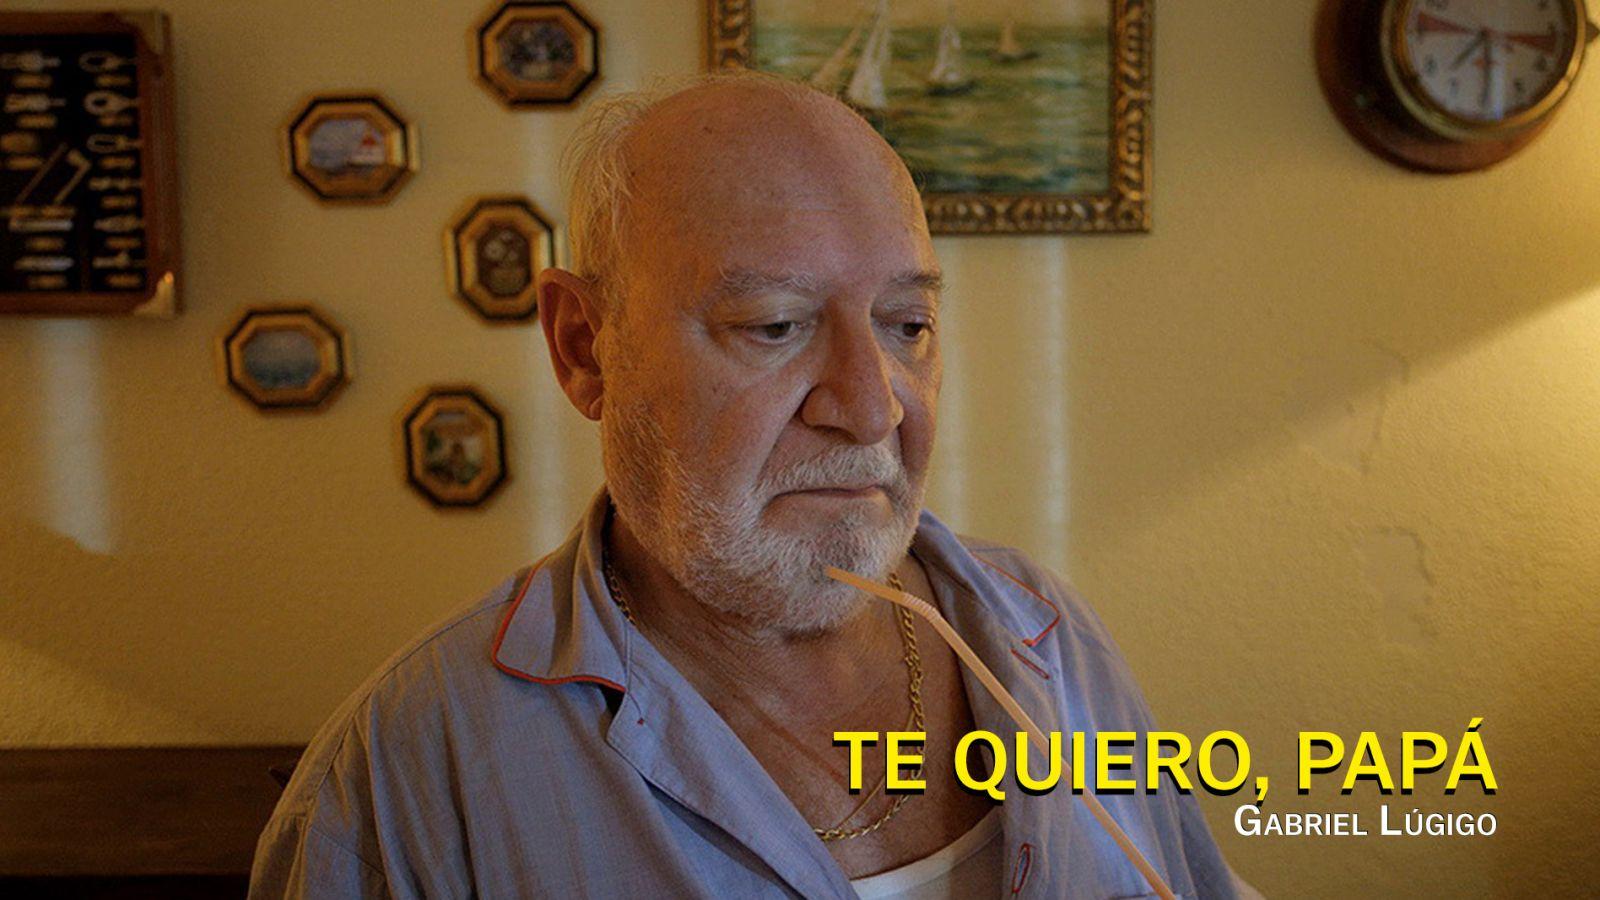 Te quiero papa, Gabriel Lugido